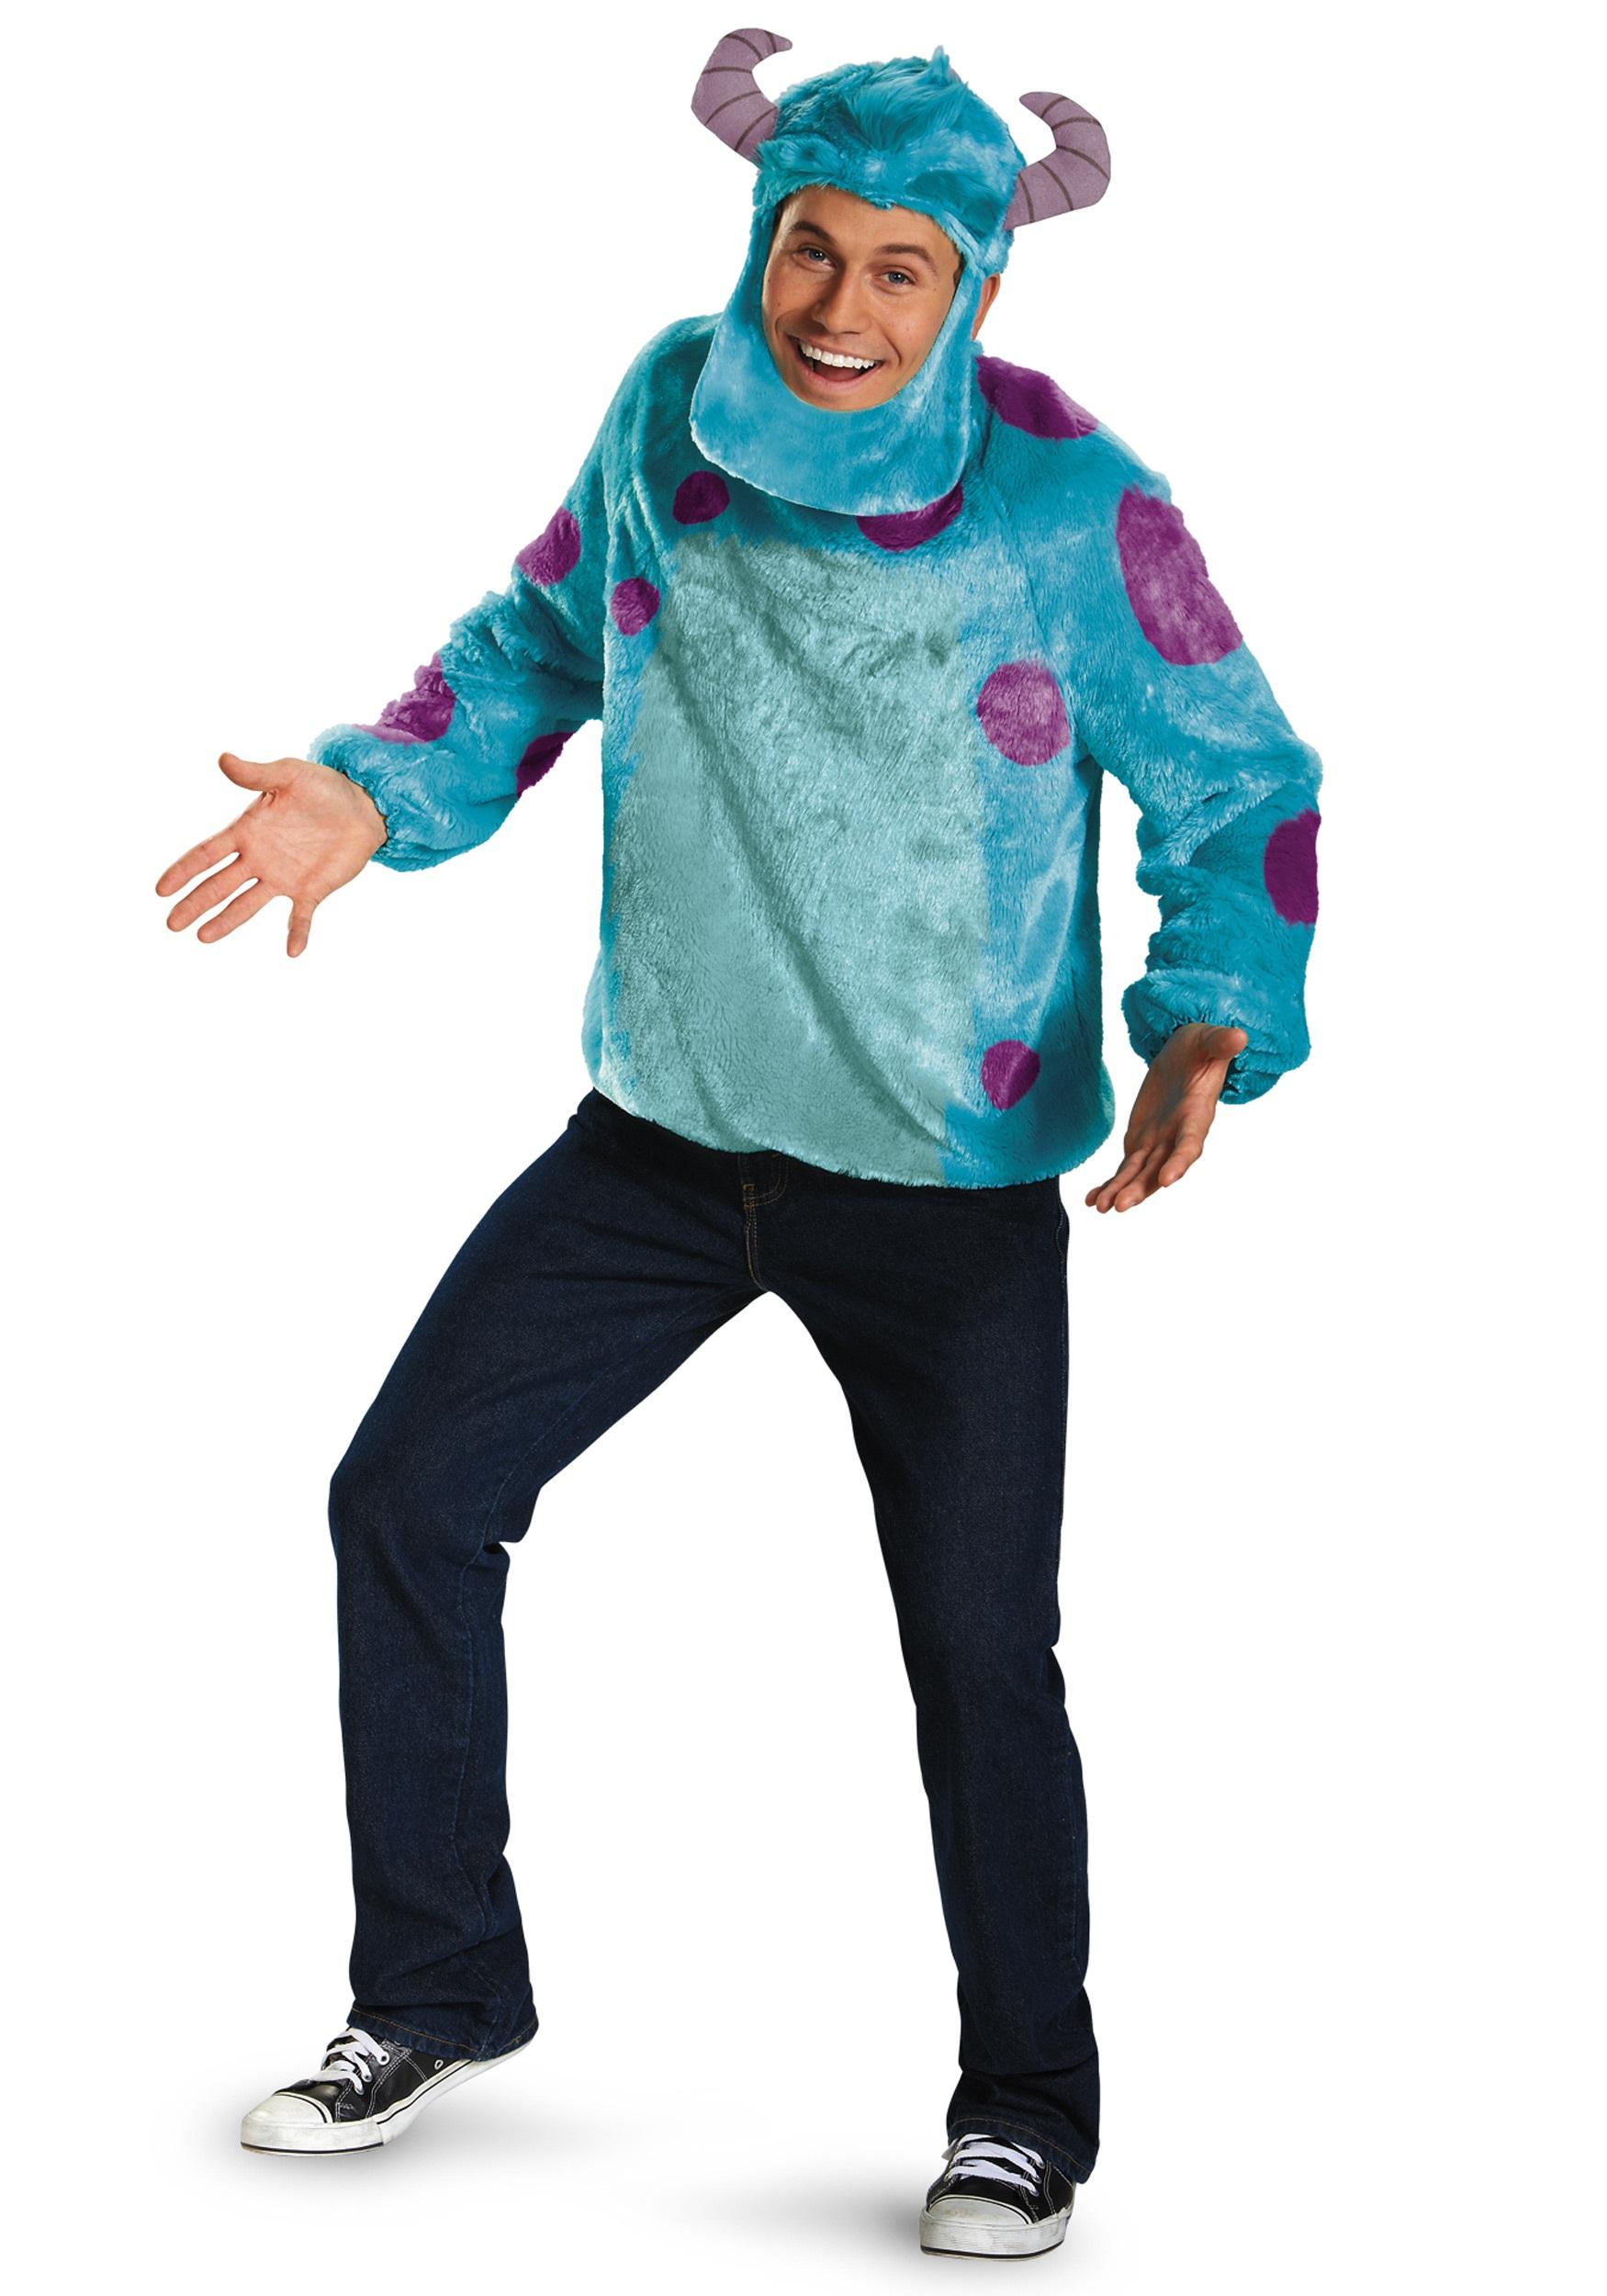 e52b2ed60ec7 Monsters Inc Plus Size Deluxe Sulley Costume